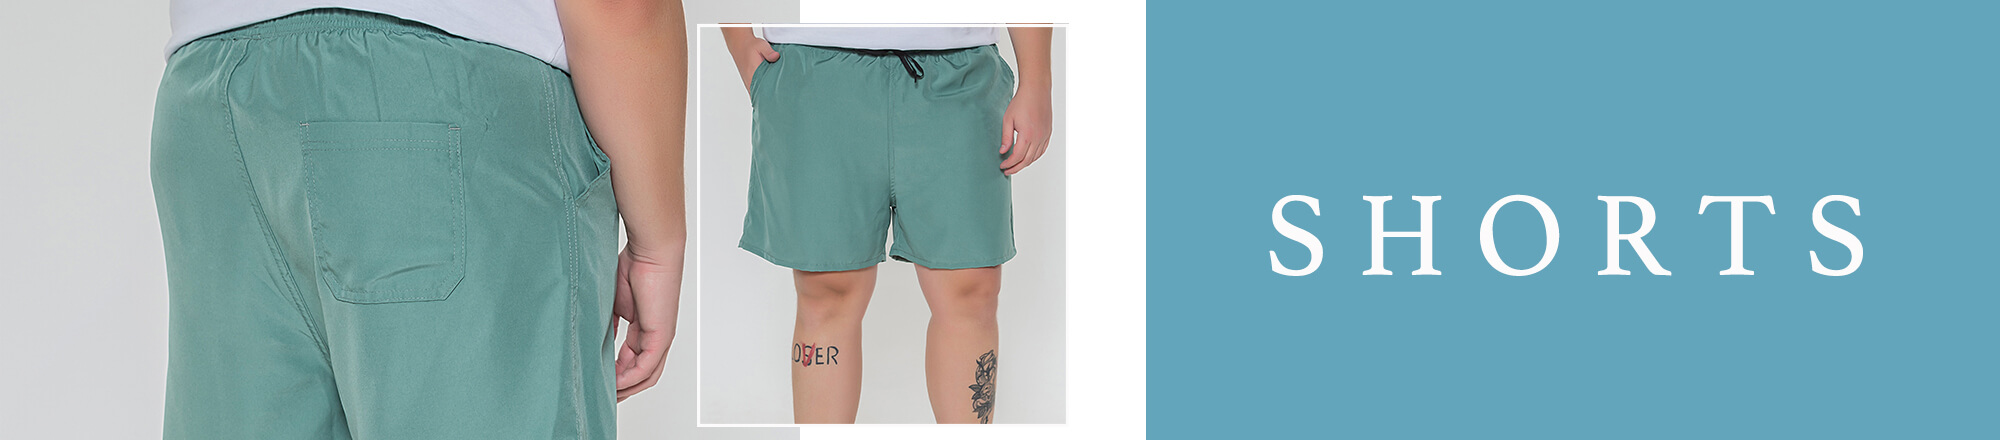 banner-shorts